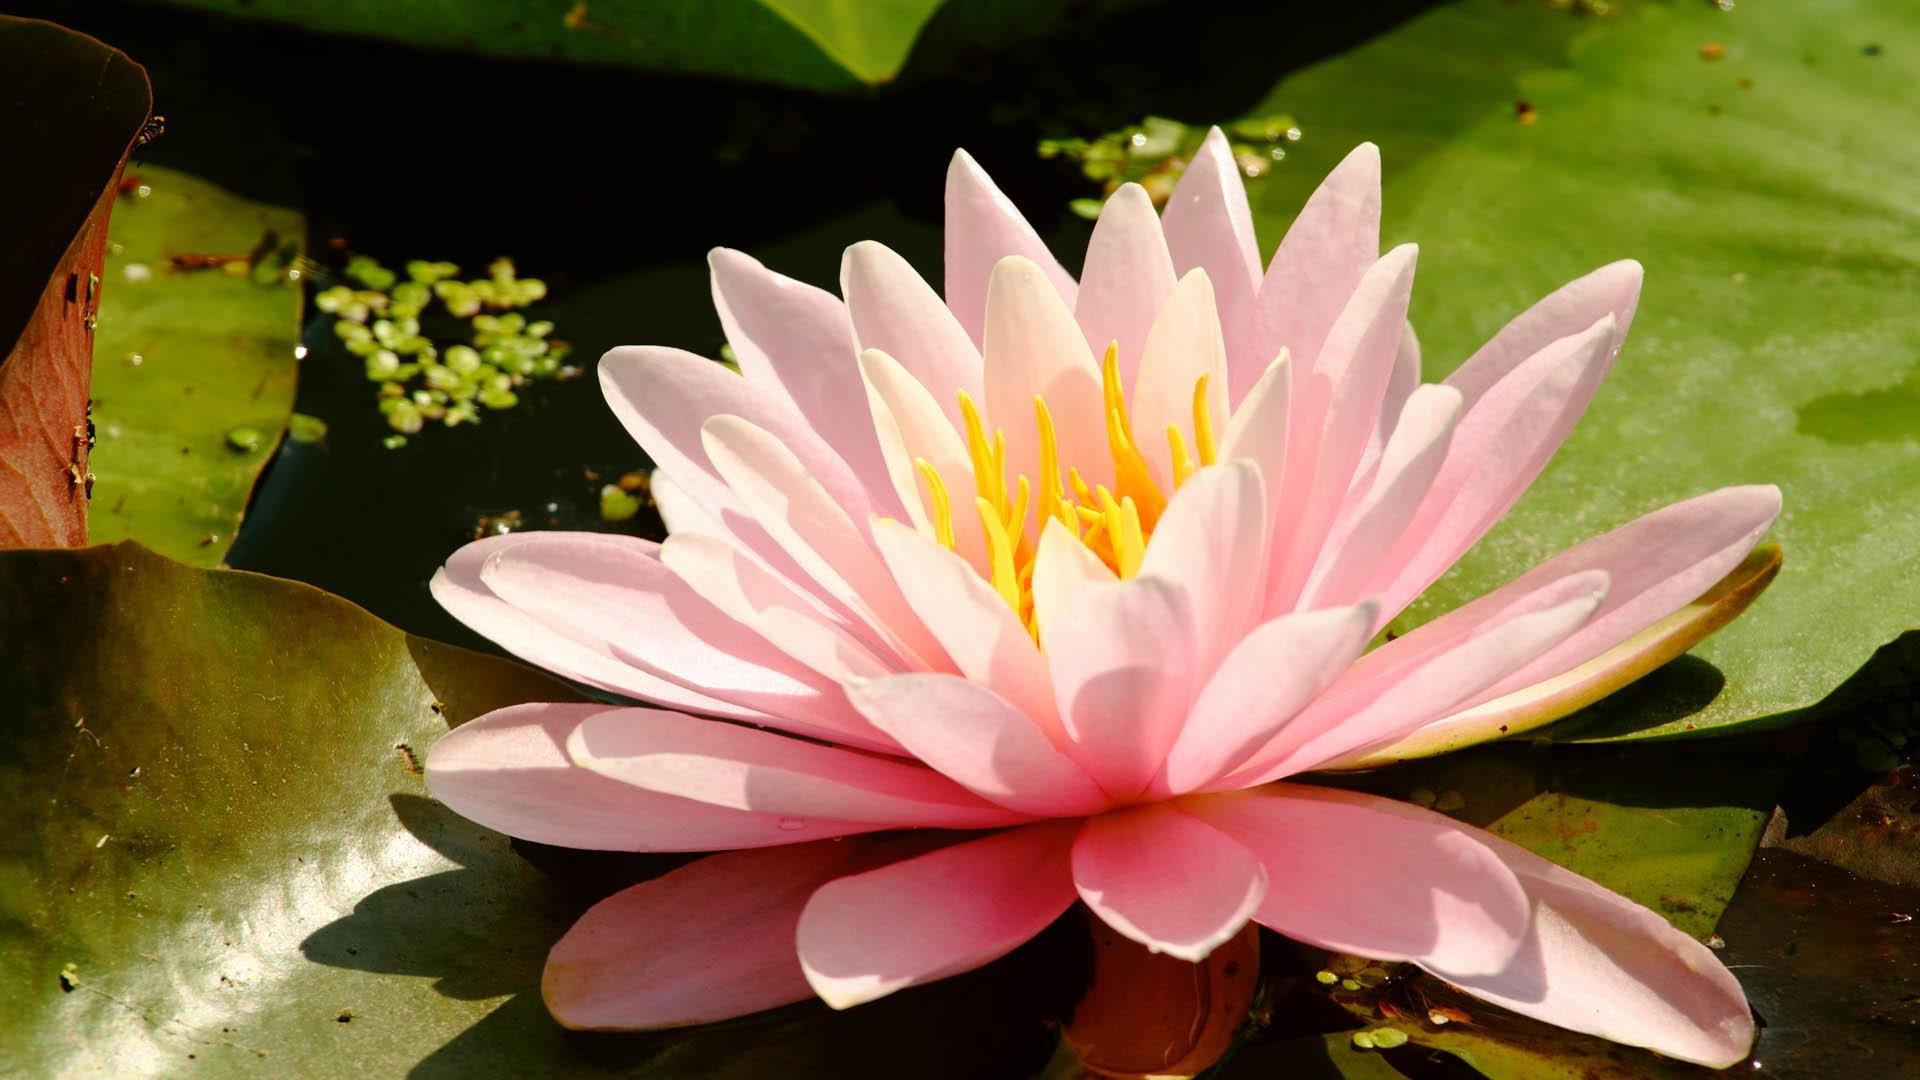 Full Hd Lotus Flower , HD Wallpaper & Backgrounds